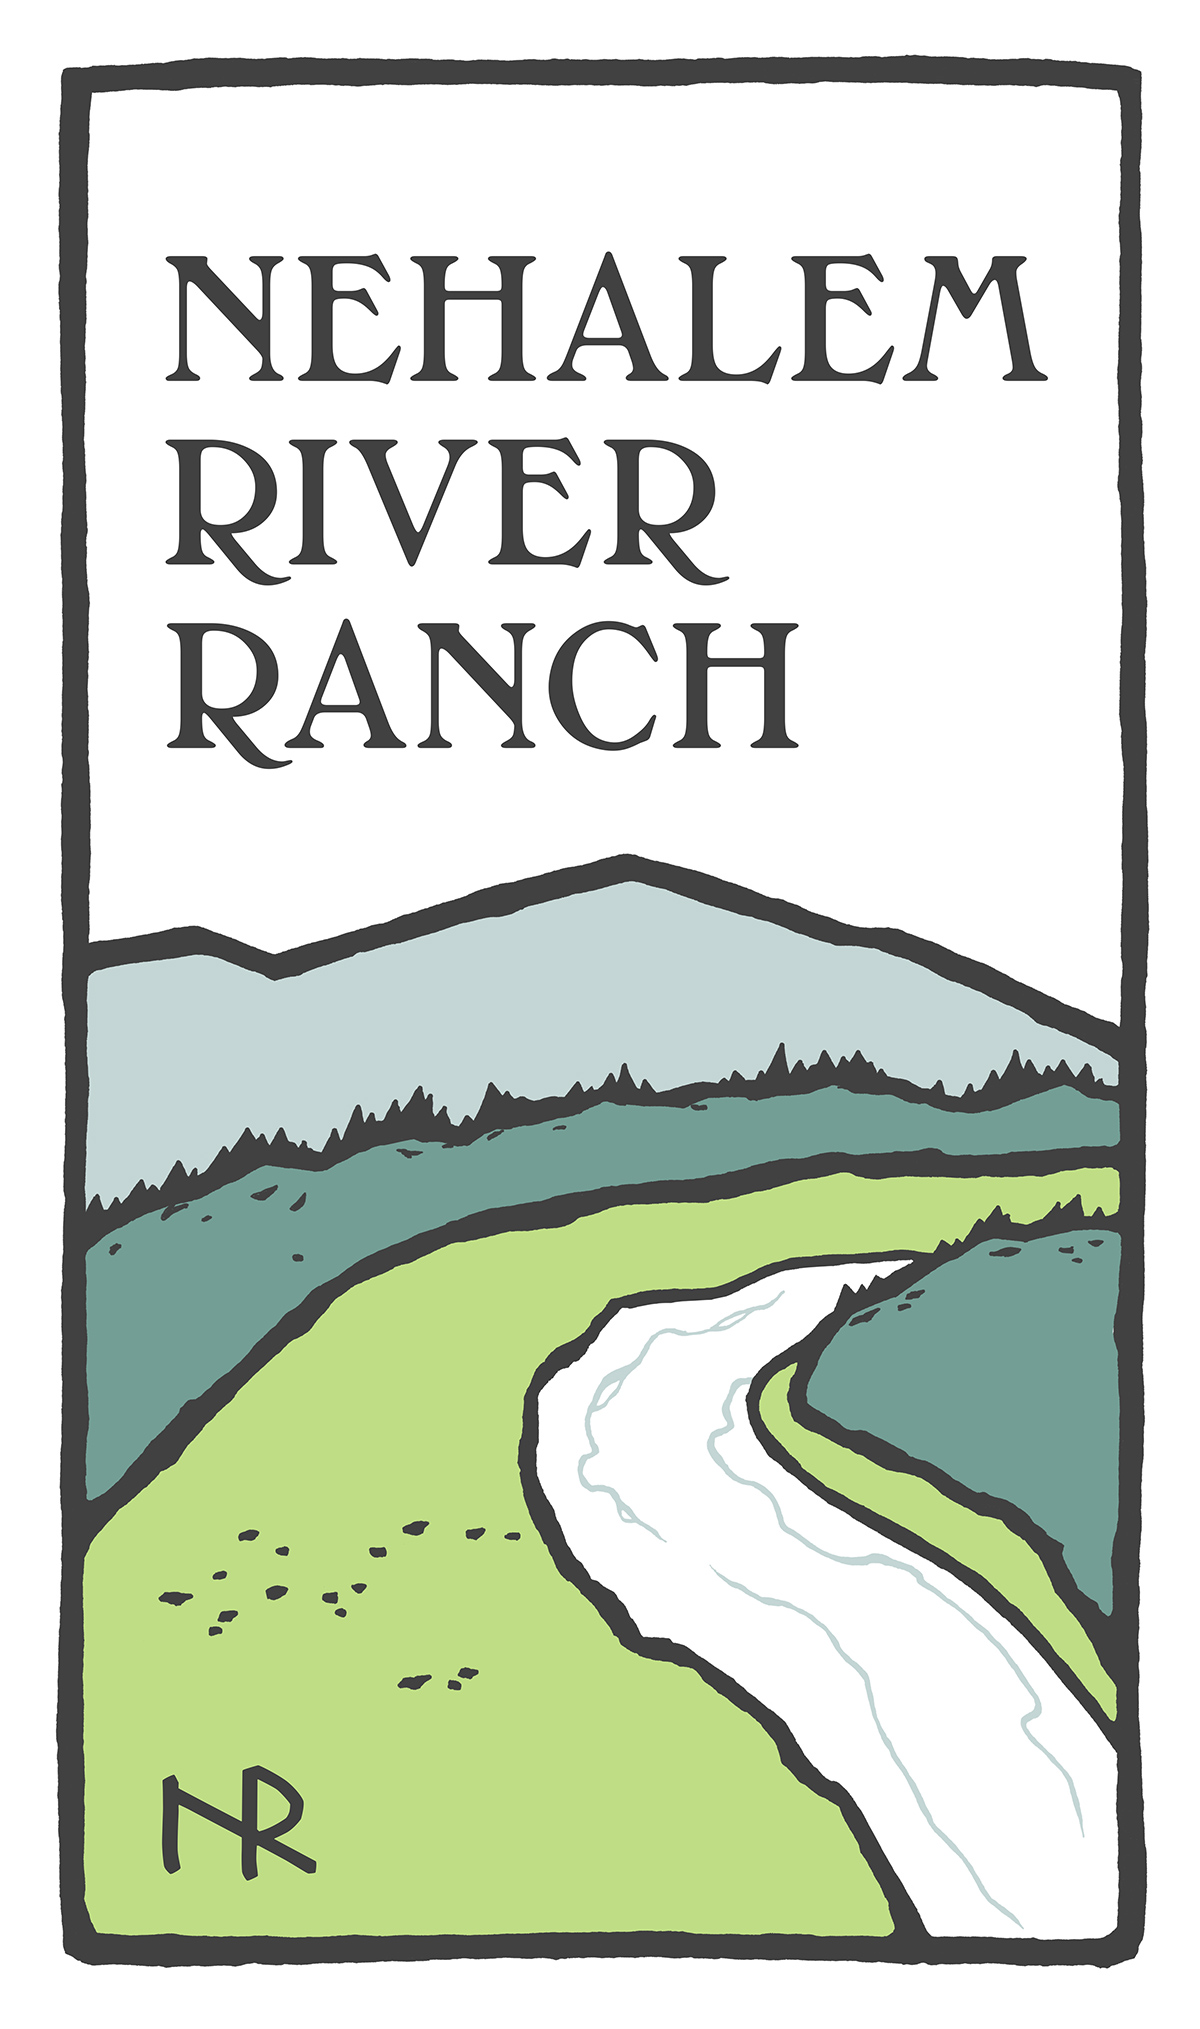 Nehalem_River_Ranch_Logo_tall_color_4x6in.jpg